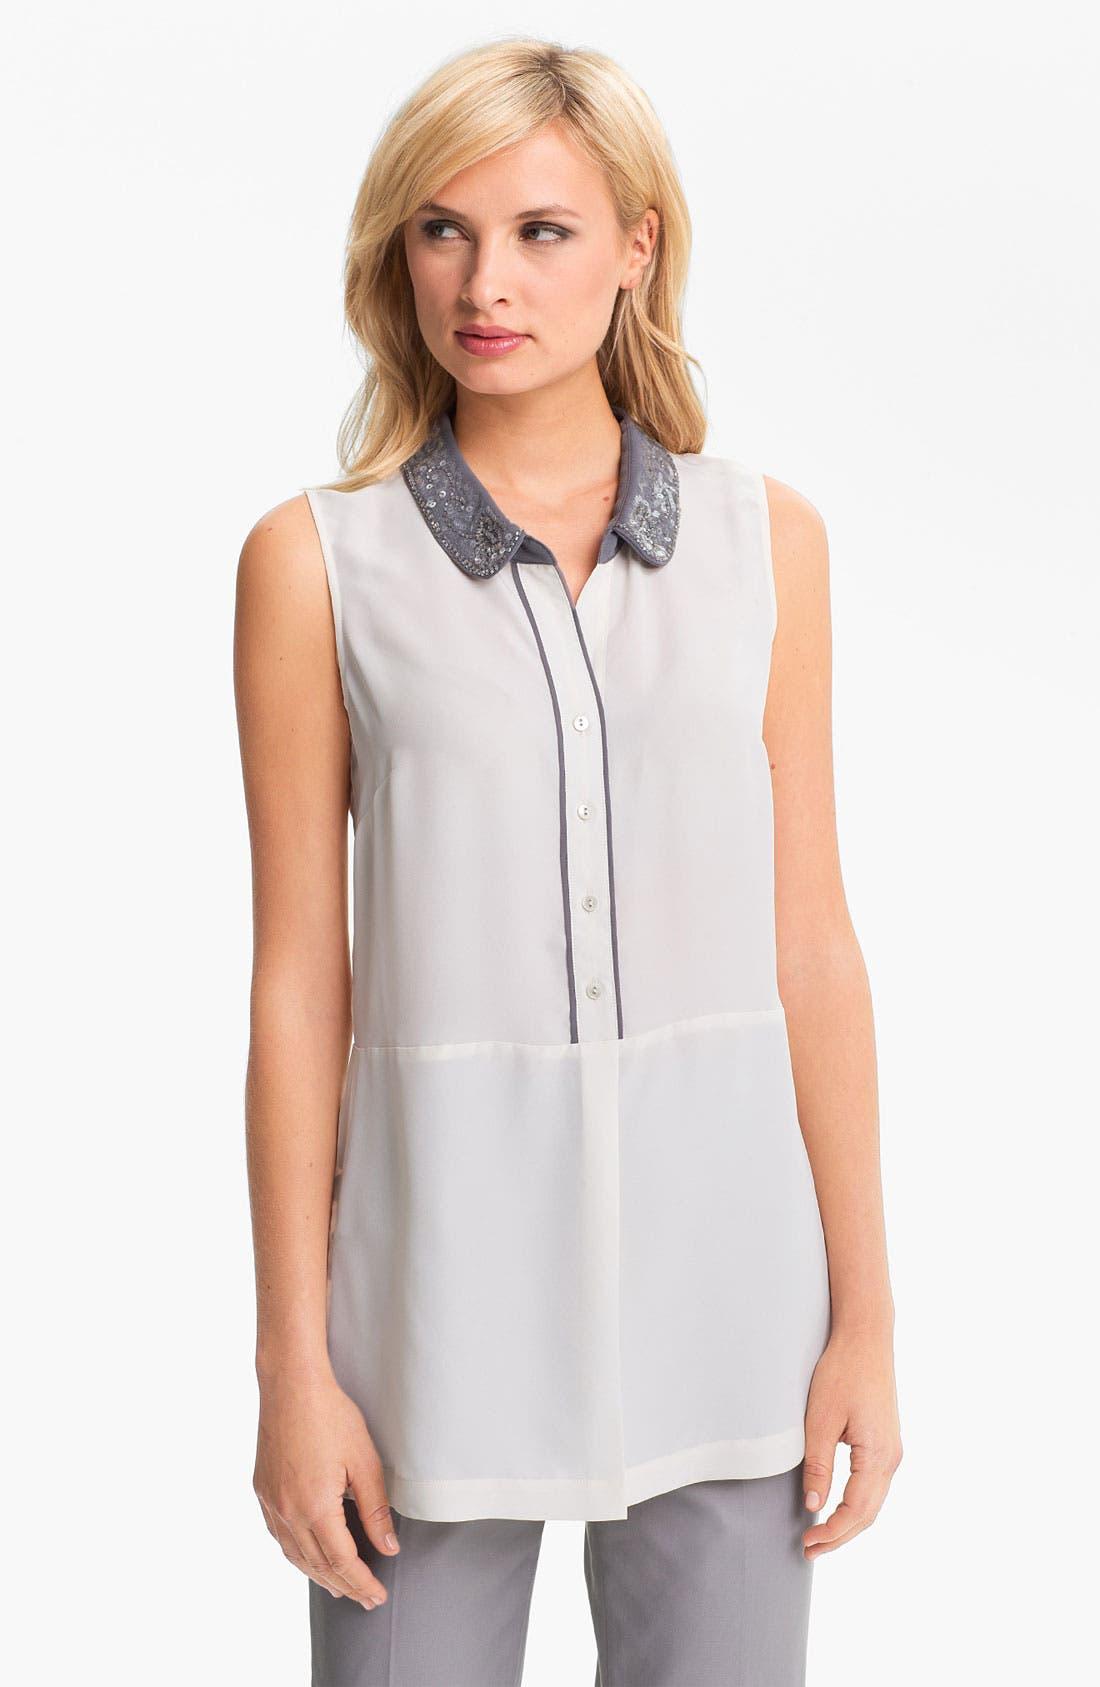 Alternate Image 1 Selected - Nic + Zoe Sequin Collar Sleeveless Blouse (Petite)